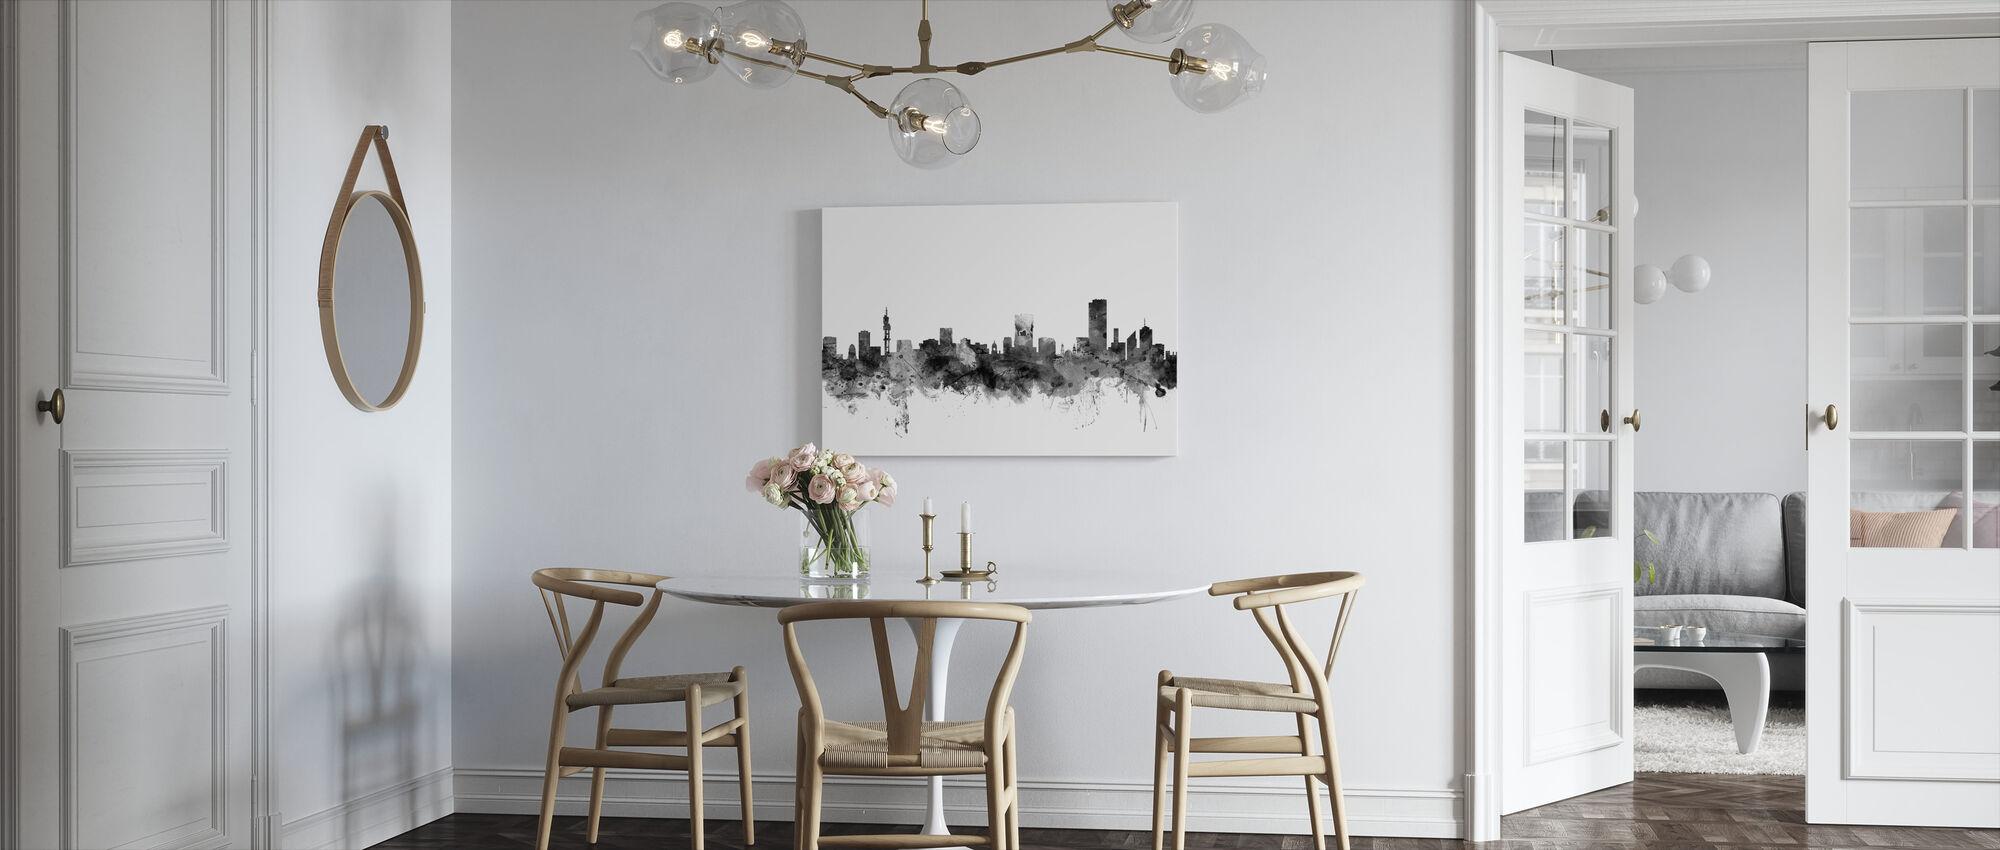 Pretoria South Africa Skyline Black - Canvas print - Kitchen